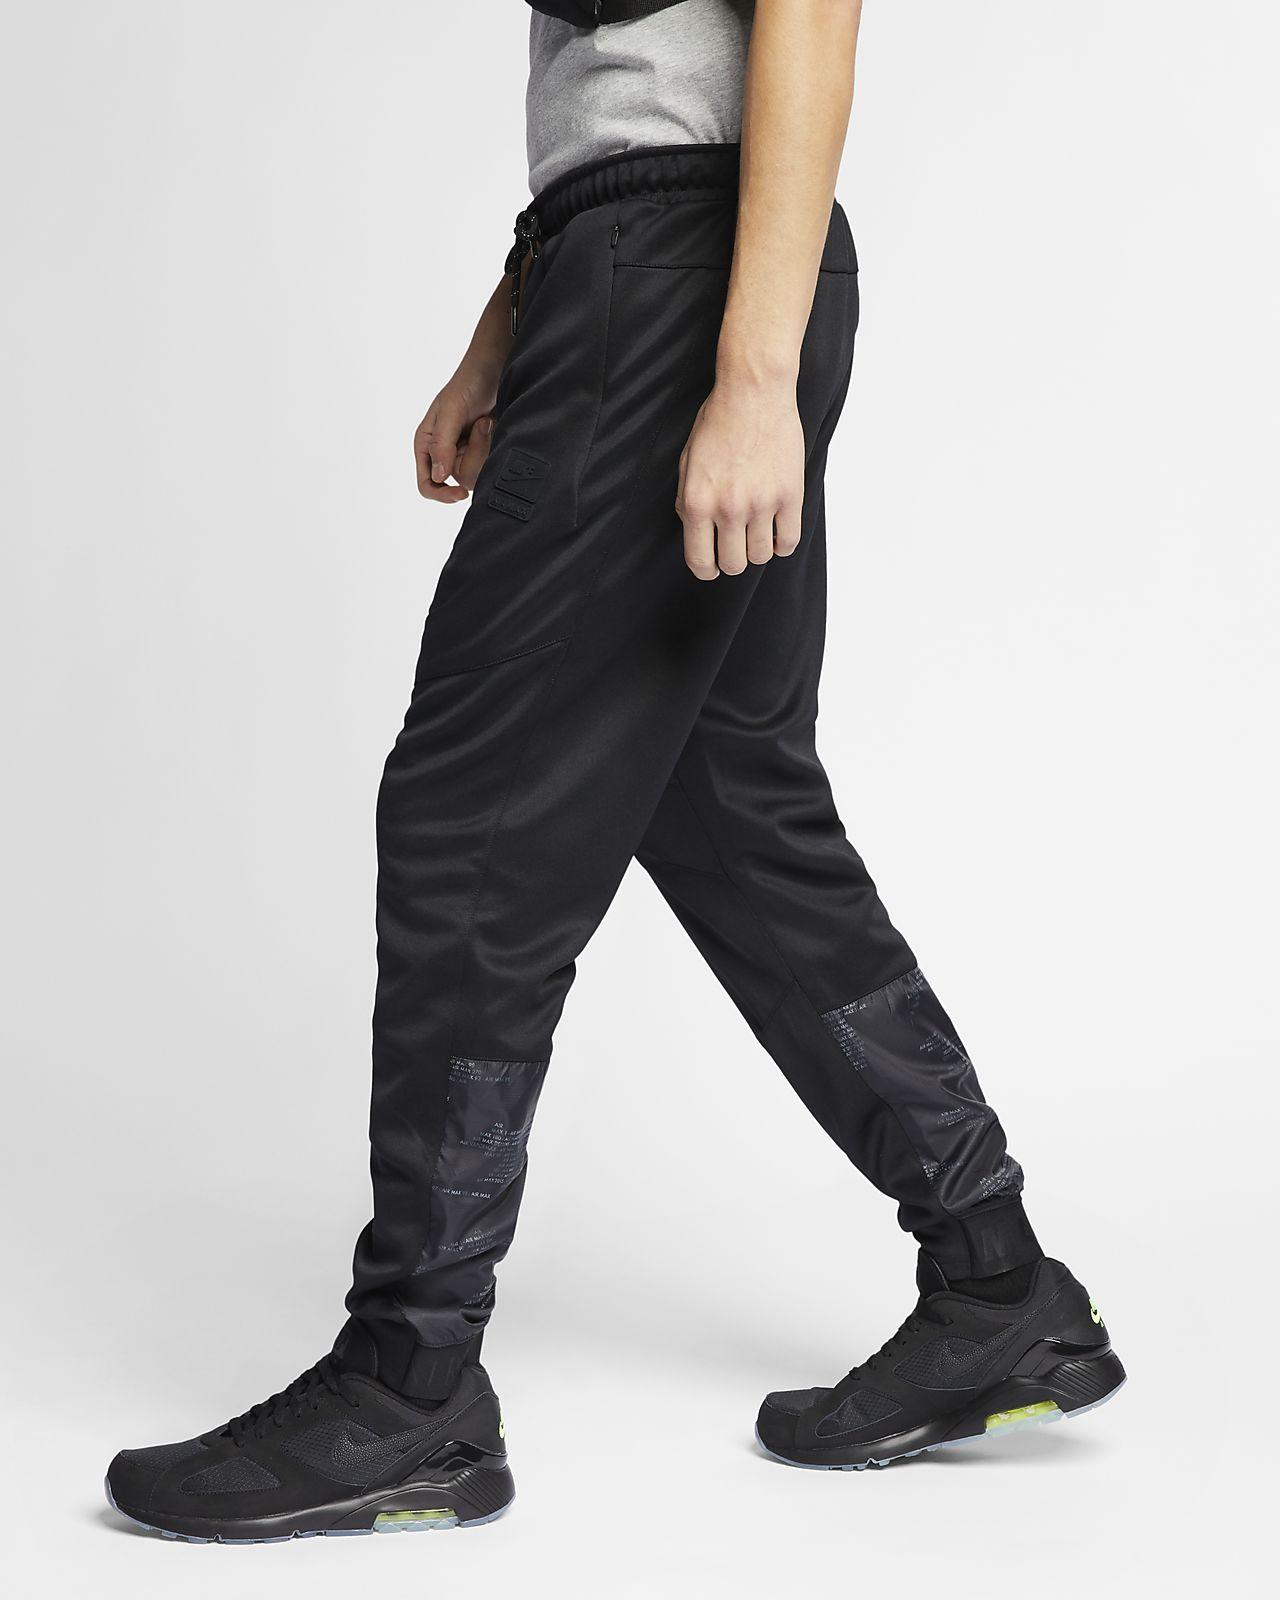 Nike Air Max Men's Joggers